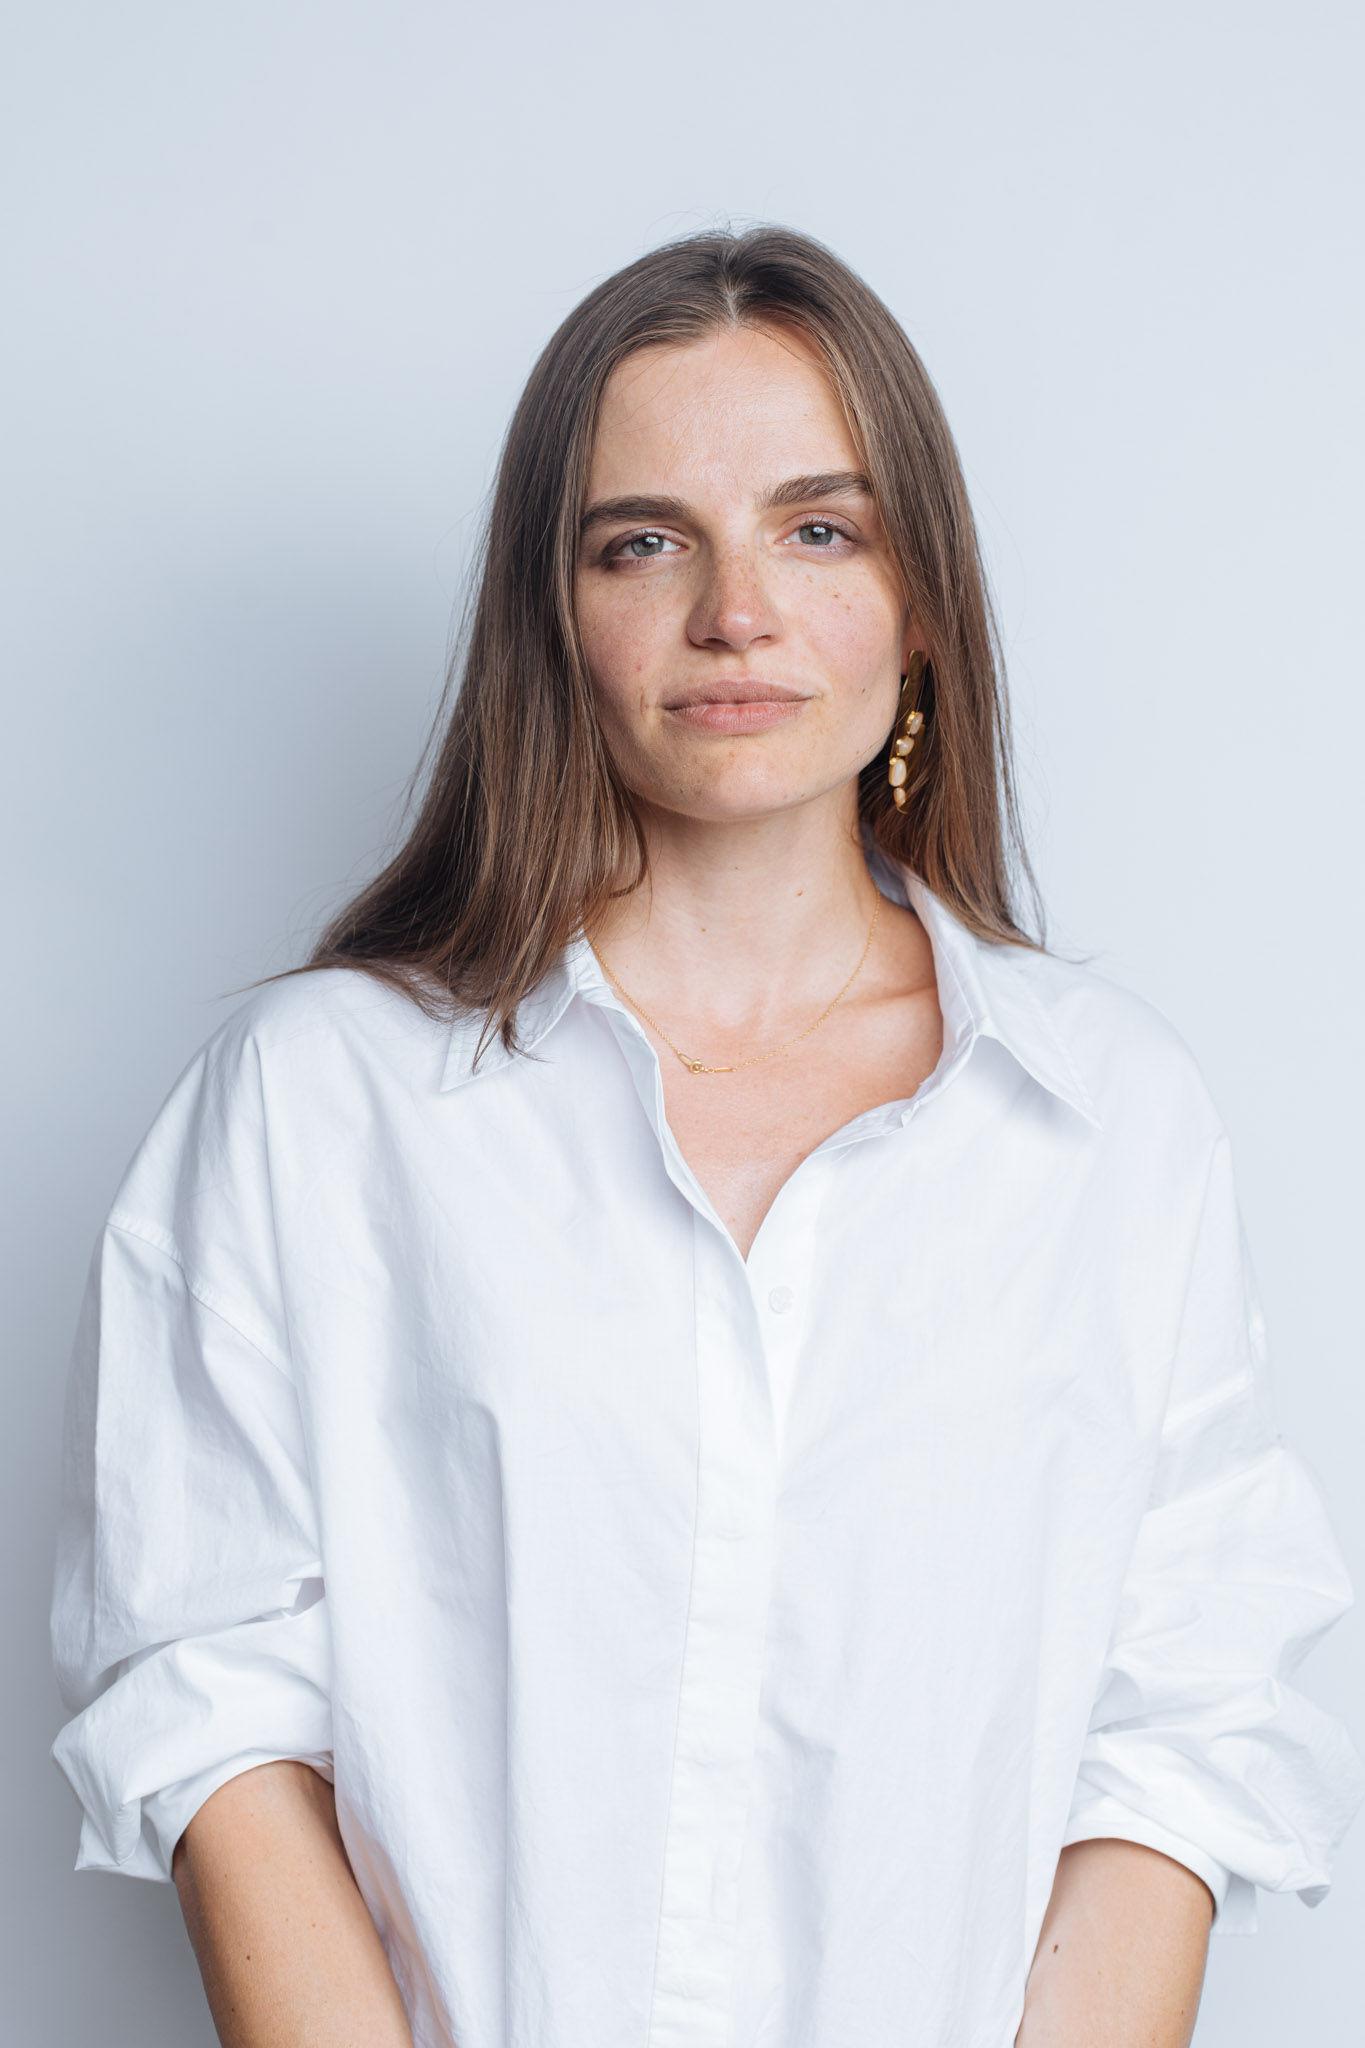 Ieva Feldmane